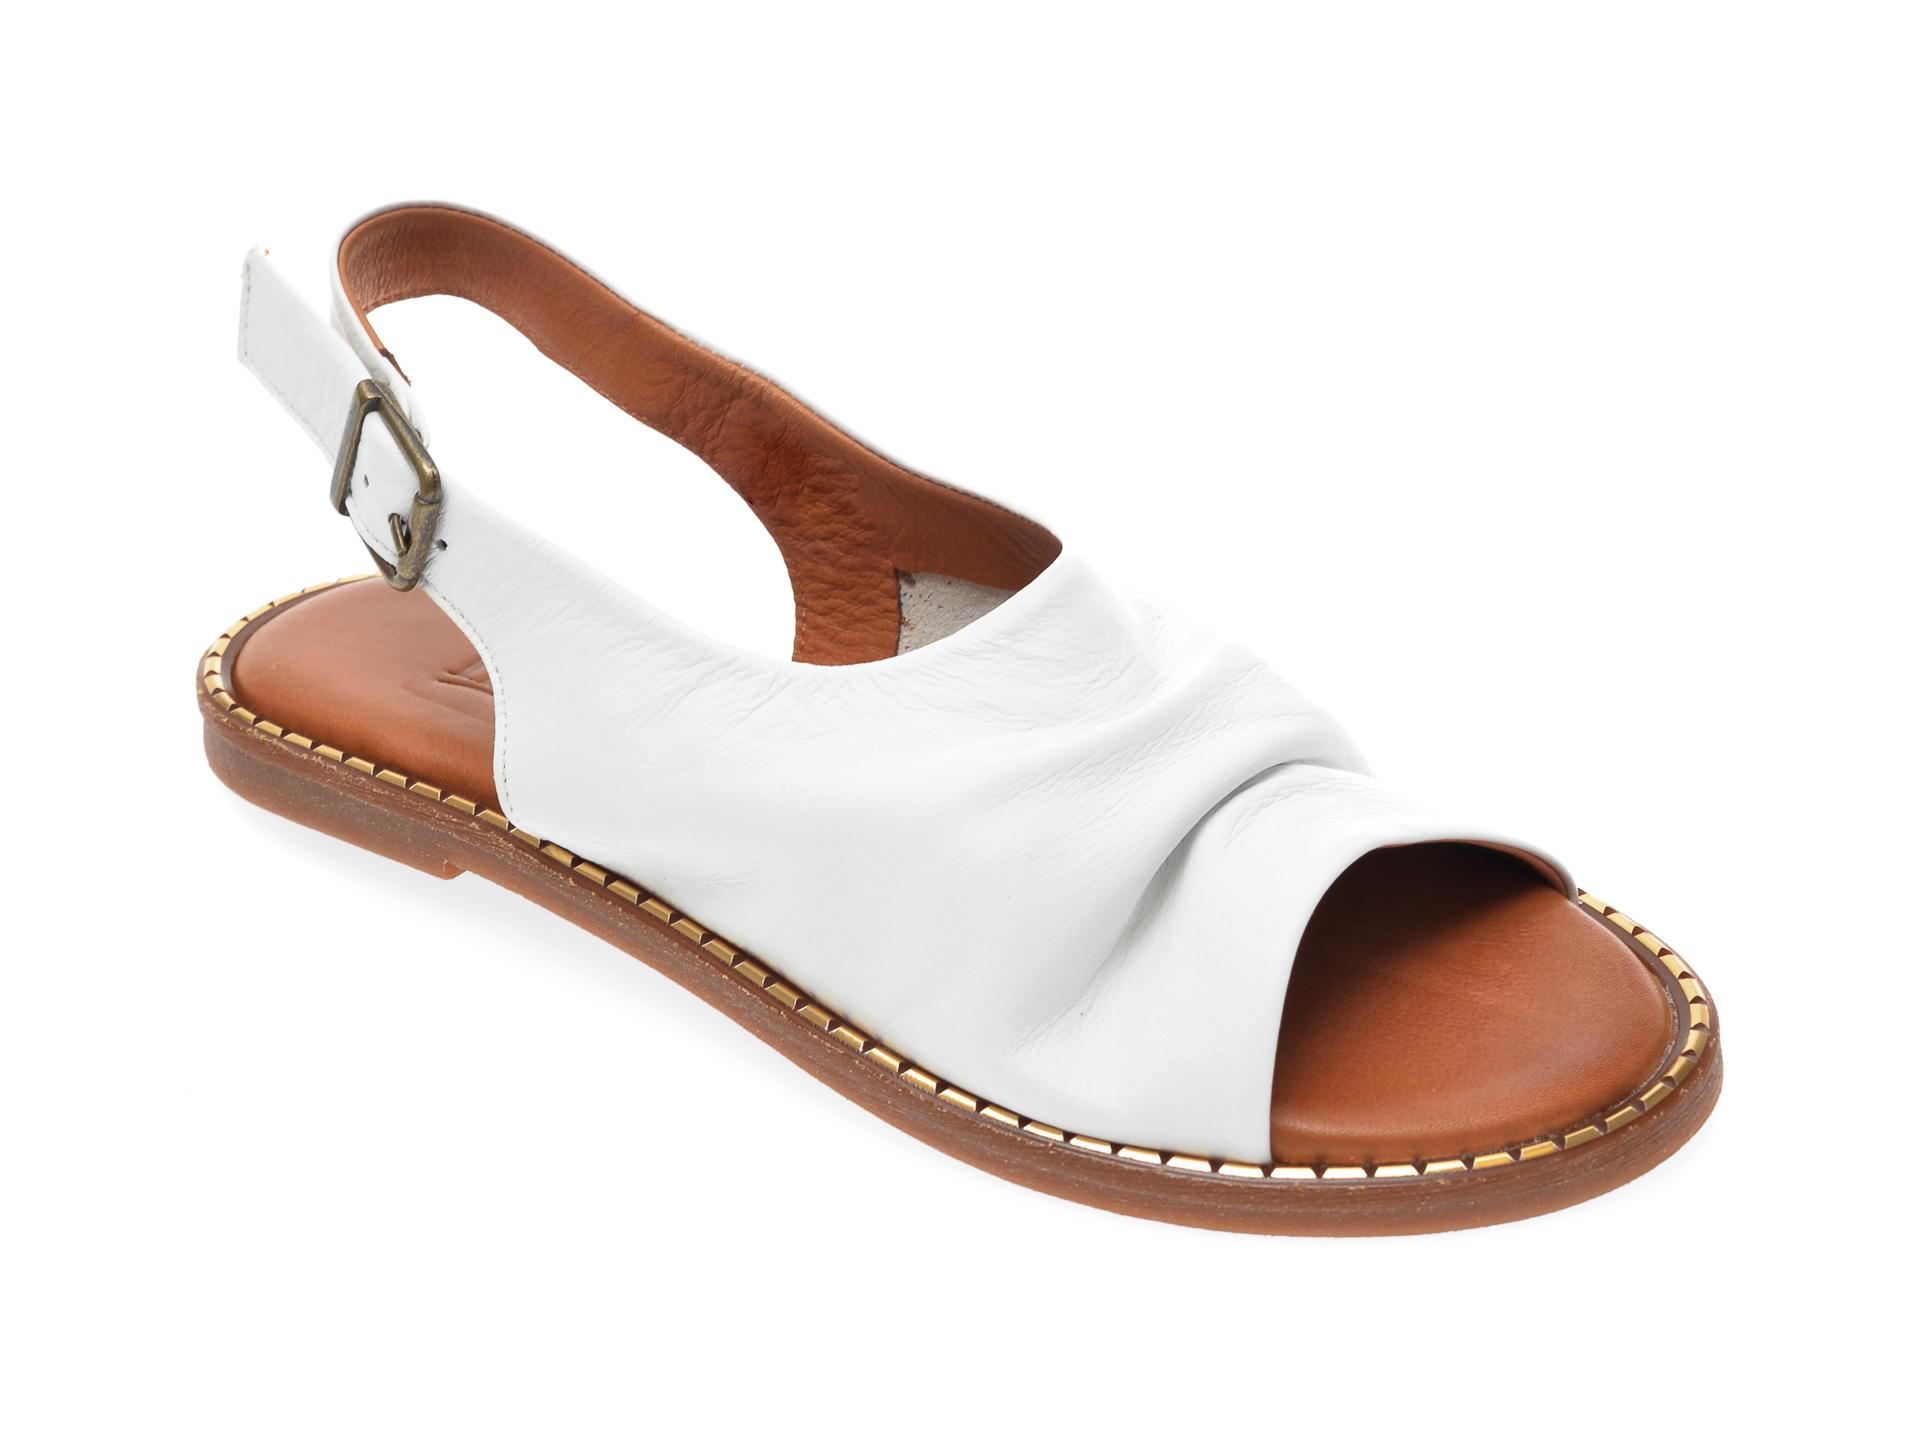 Sandale IMAGE albe, 707, din piele naturala imagine otter.ro 2021